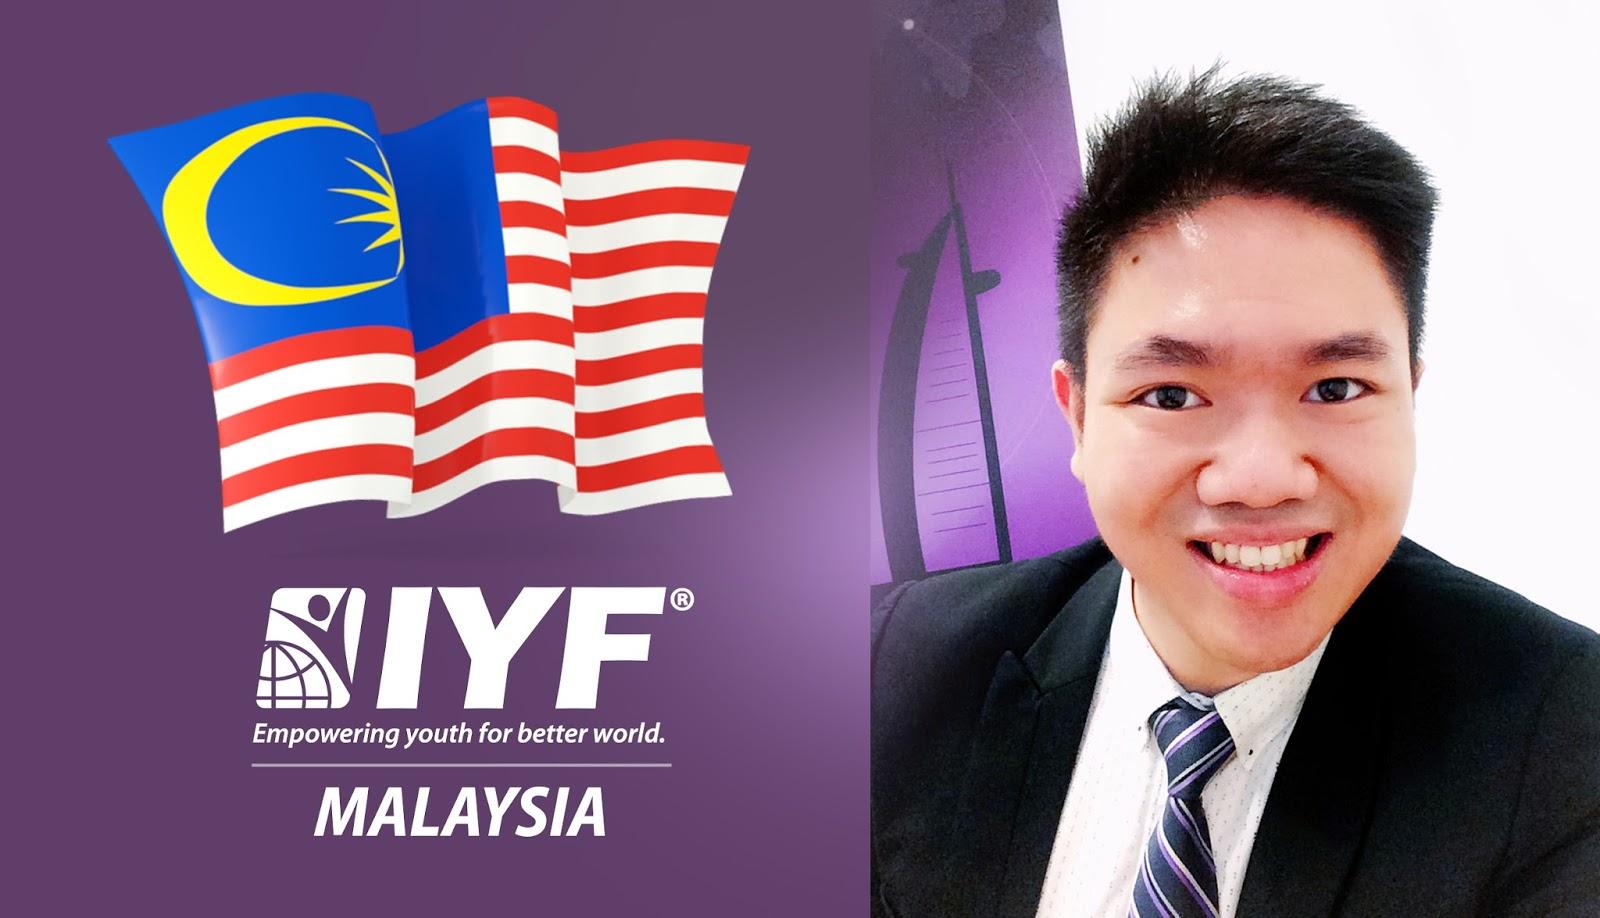 Immanuel Tan, IYF Representative in Malaysia